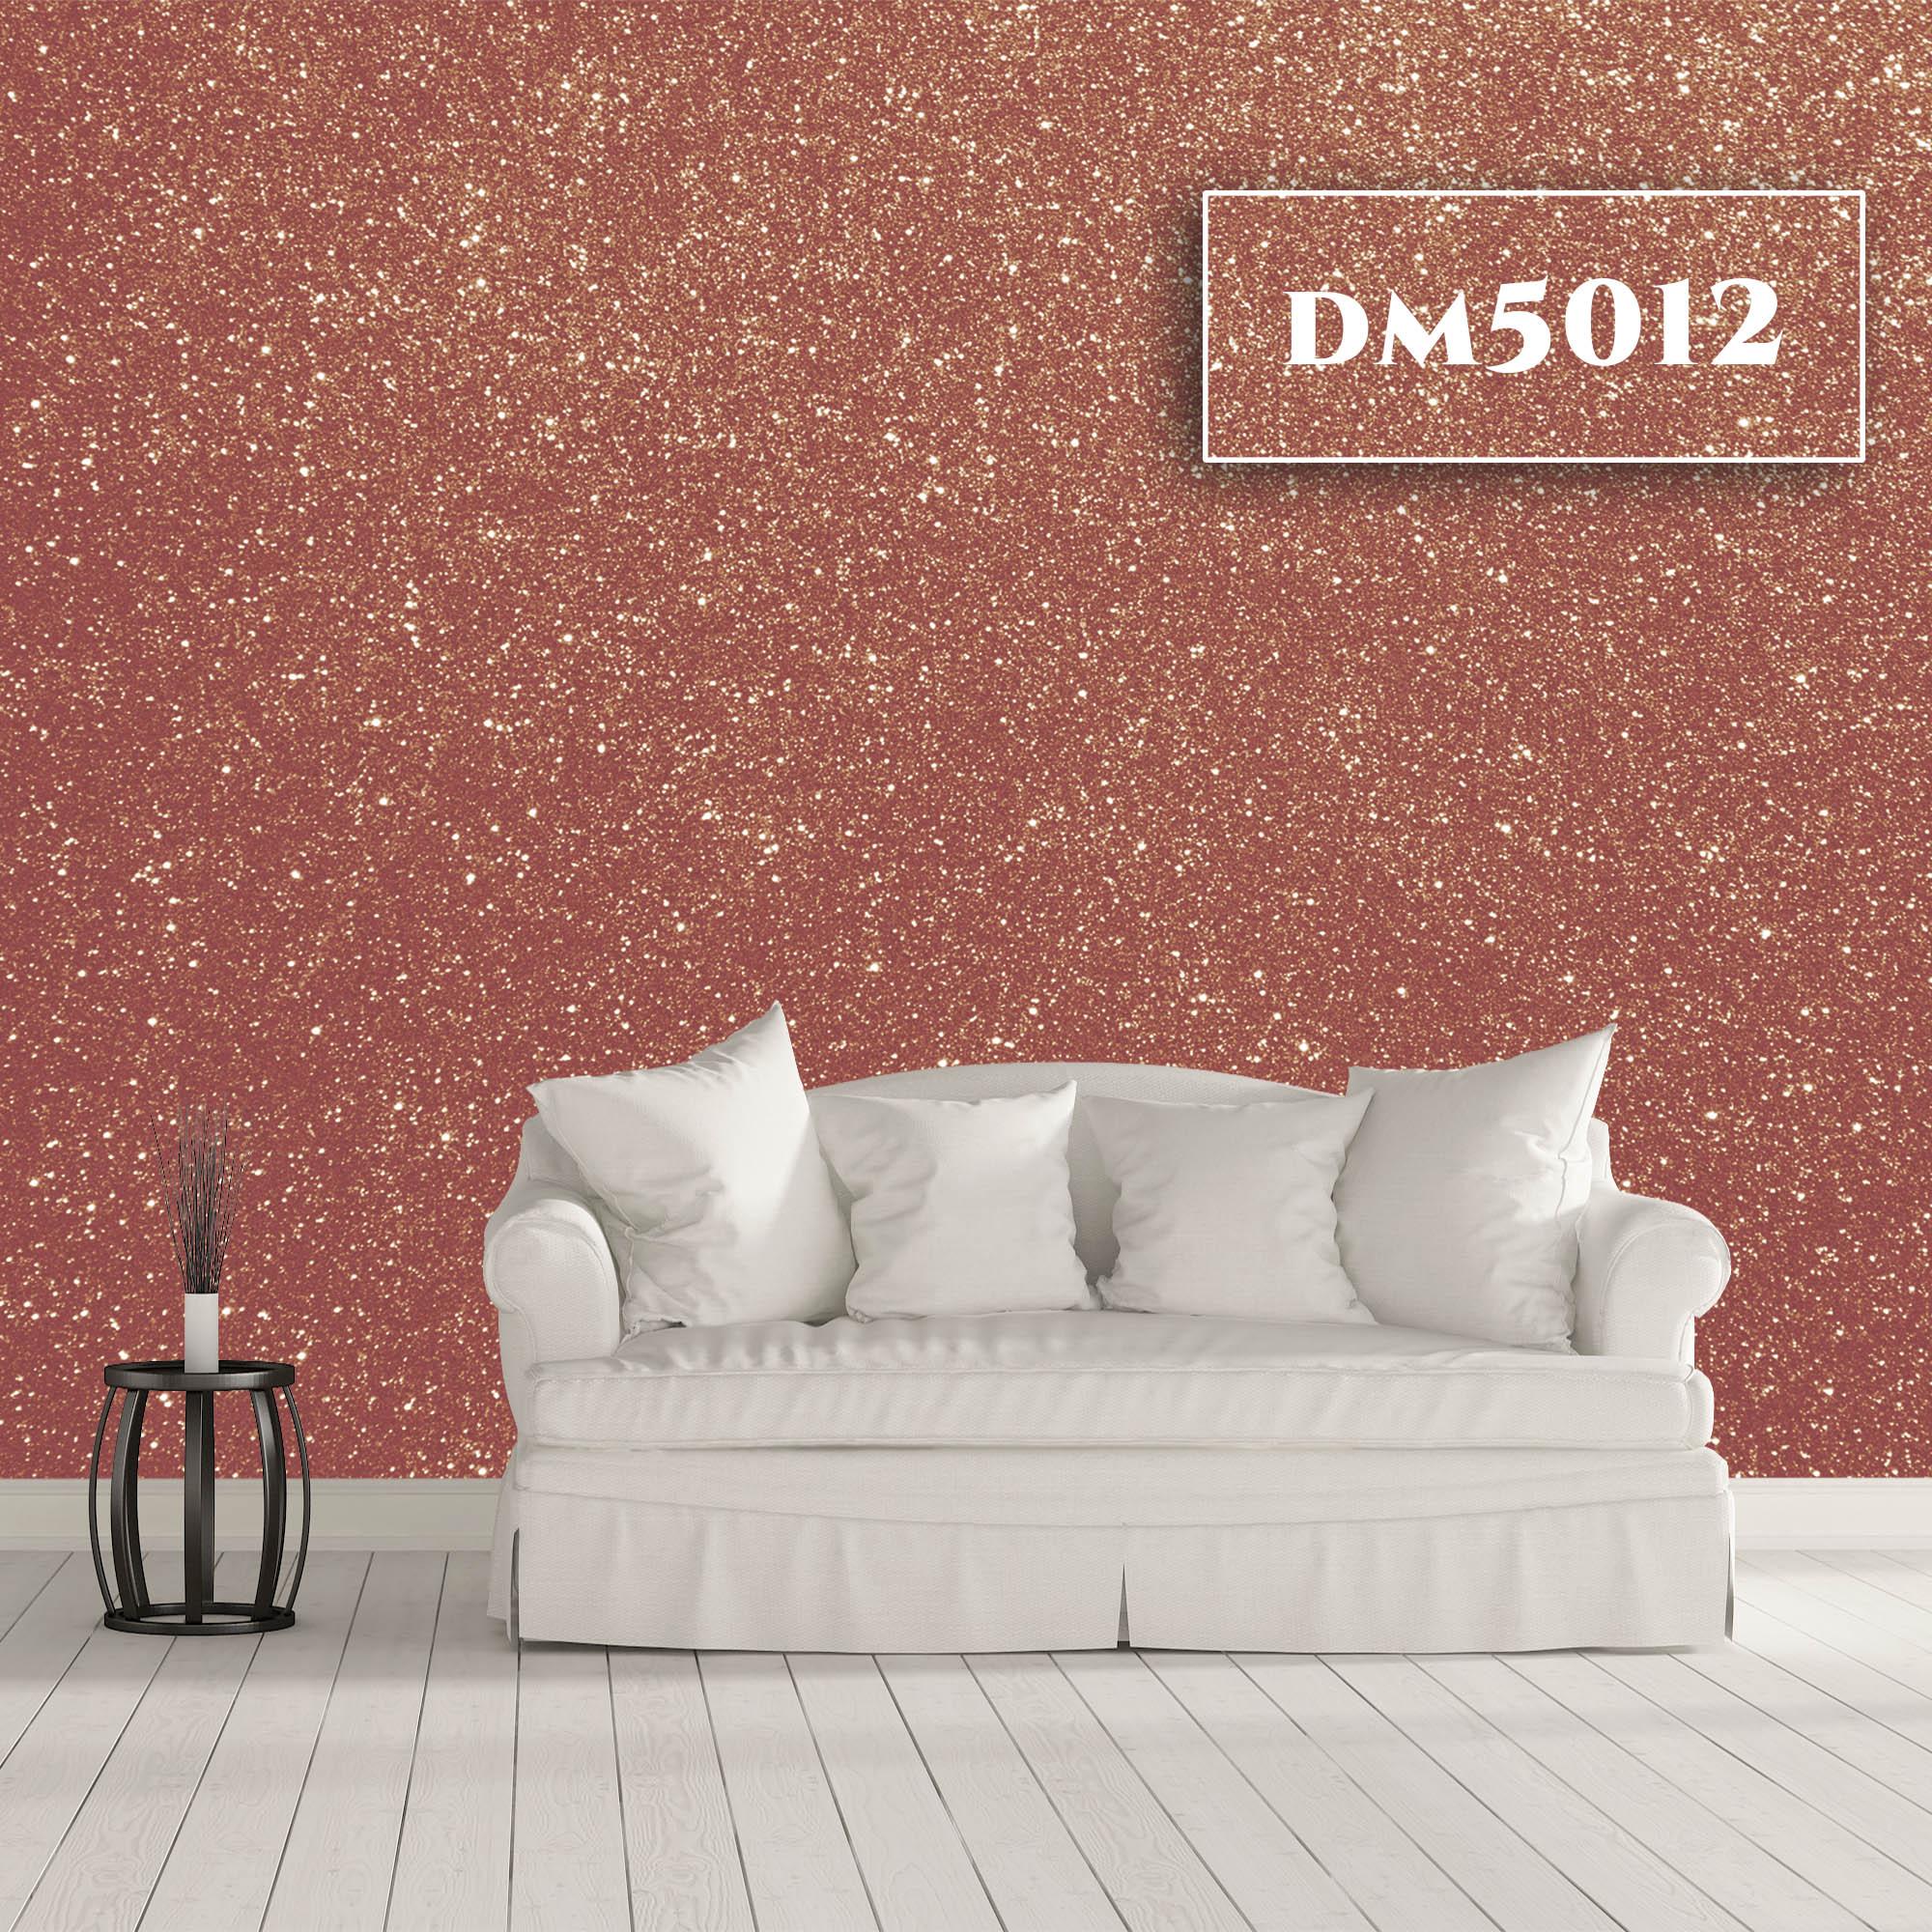 DM5012